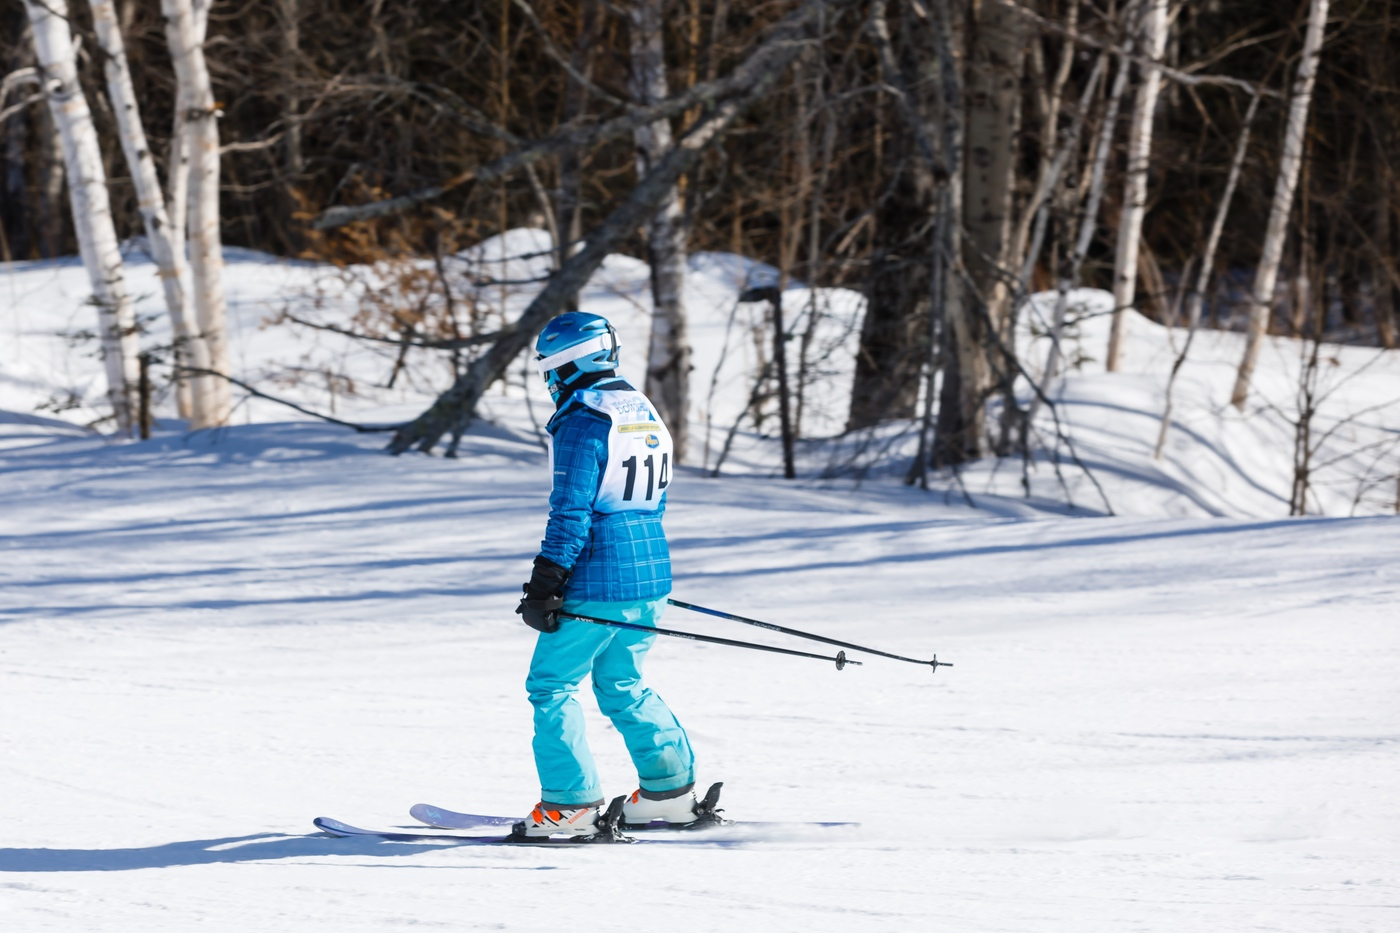 WinterKids Downhill 24 2021 SDP 3228